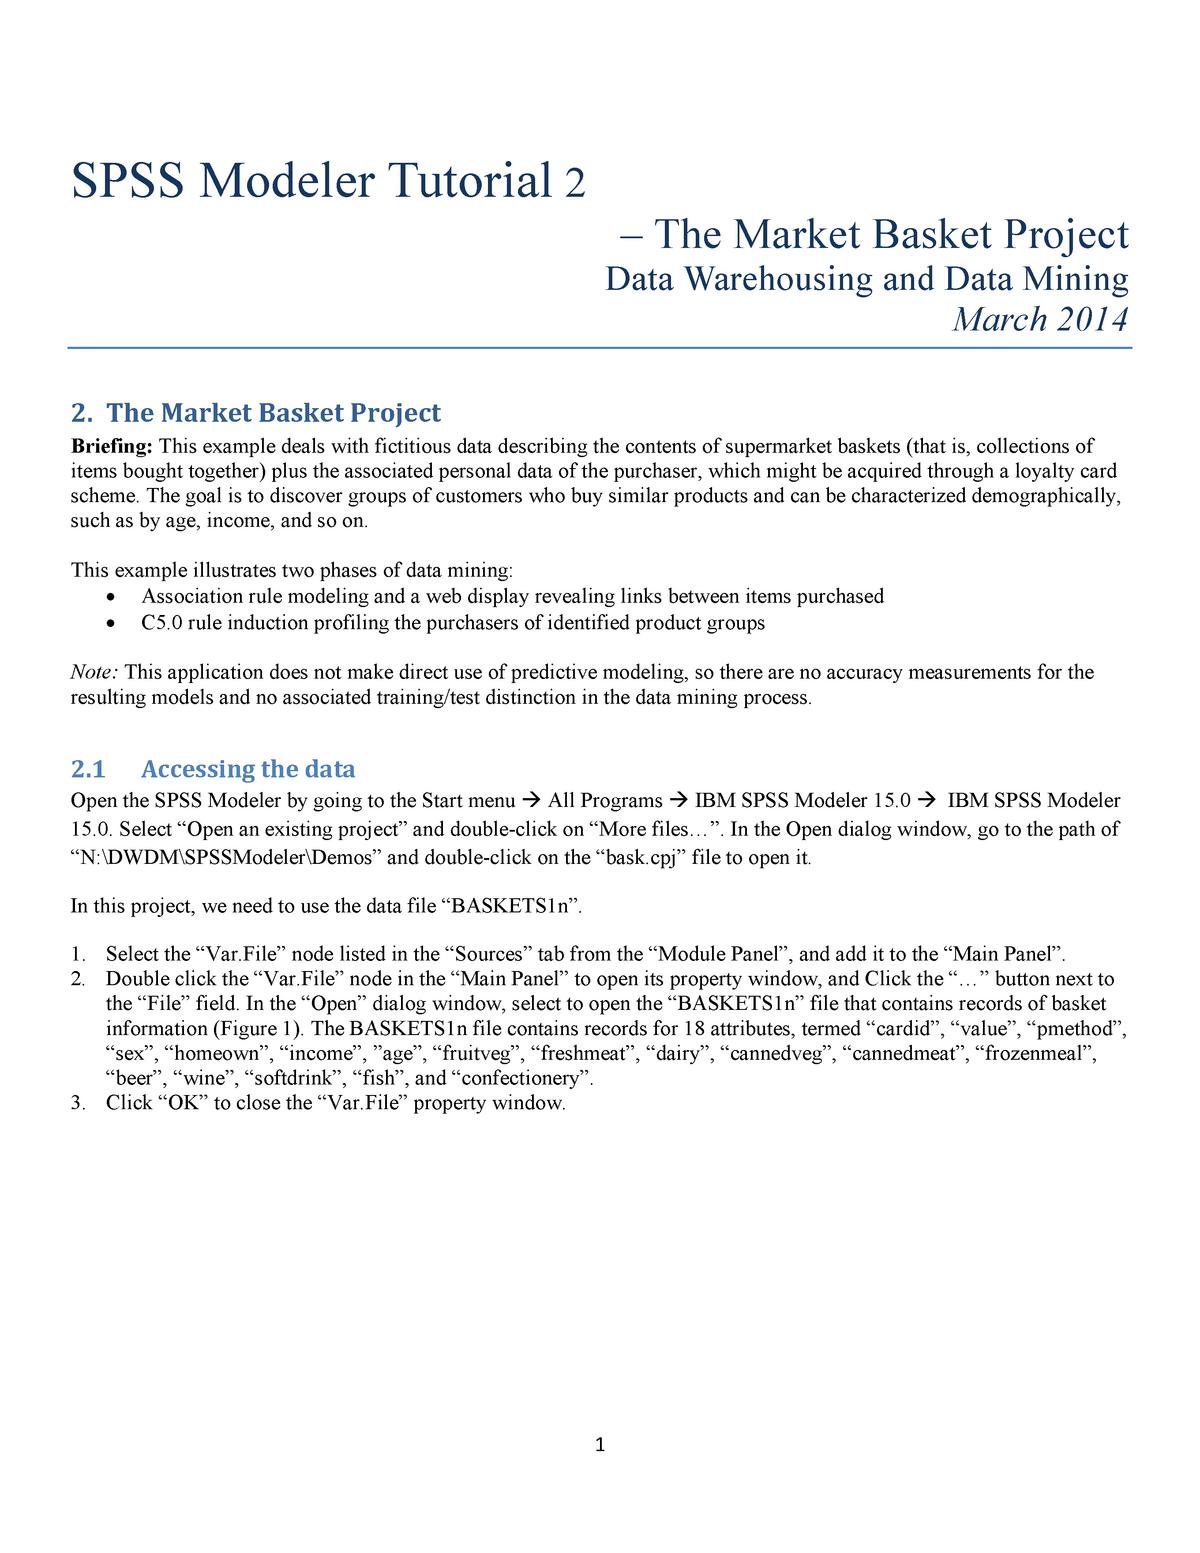 SPSS Modeler The Market Basket Project - CMPU4077: Data Analytics